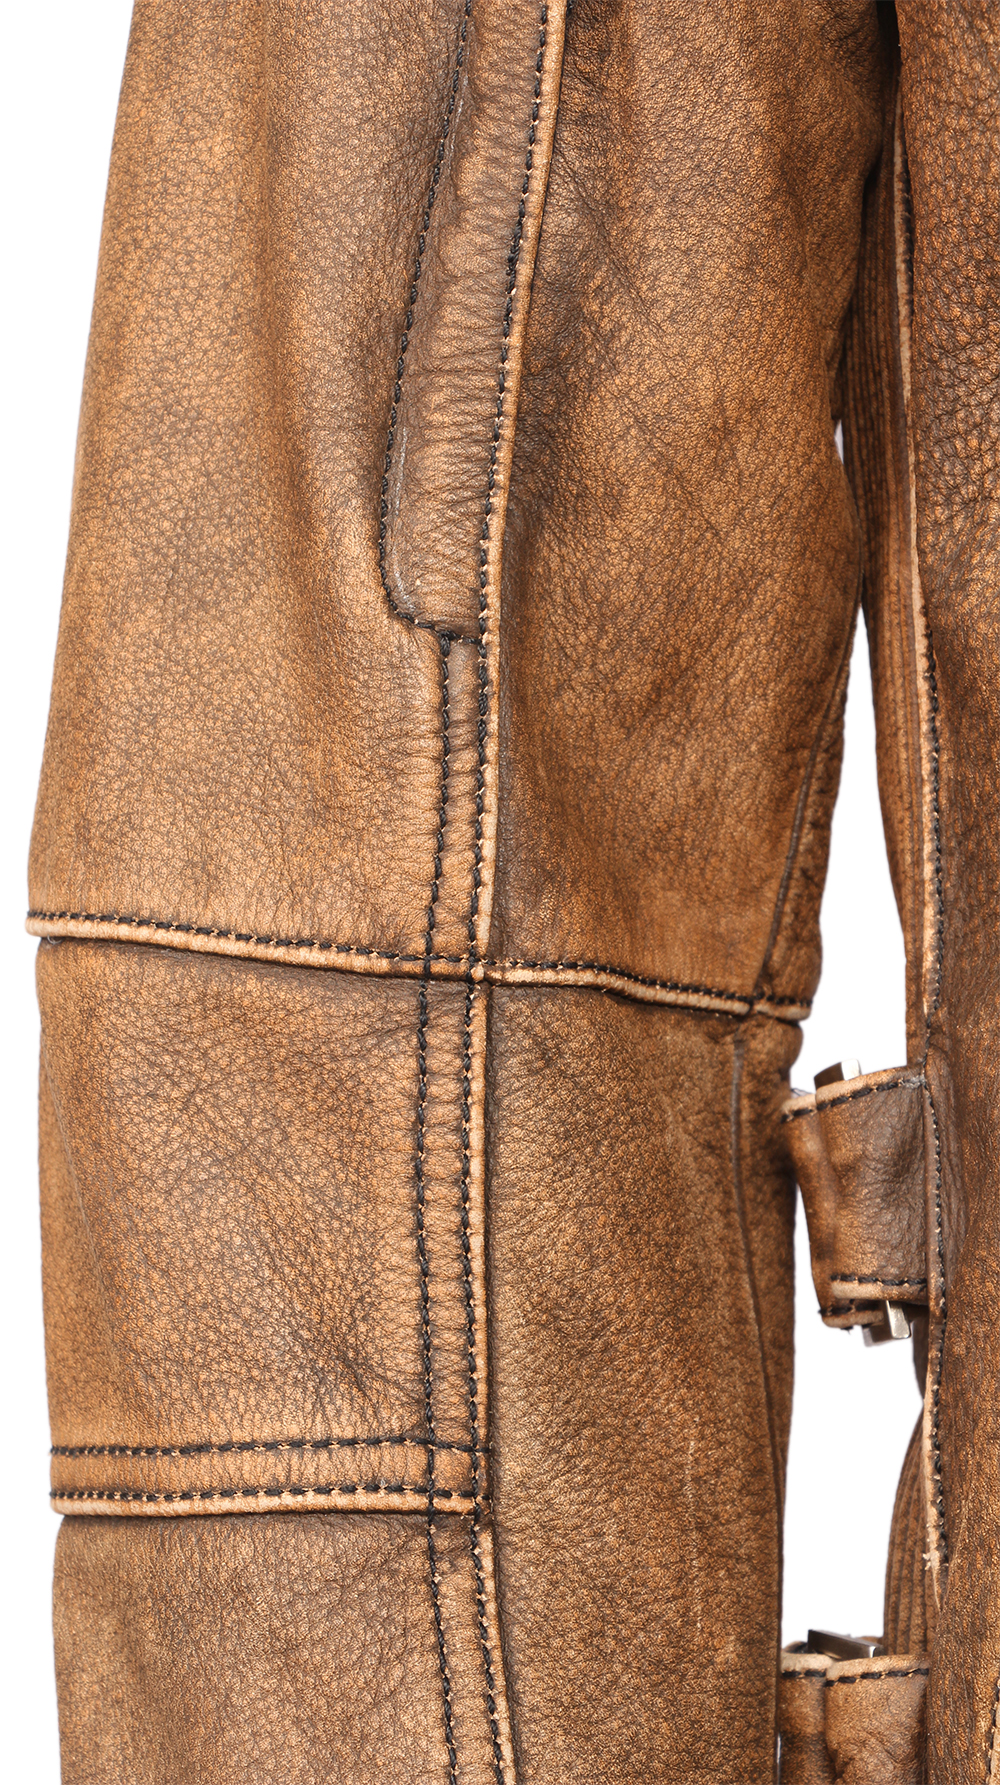 H4670b5e63241459f9cd0d025b02b0e93V Vintage Motorcycle Jacket Slim Fit Thick Men Leather Jacket 100% Cowhide Moto Biker Jacket Man Leather Coat Winter Warm M455